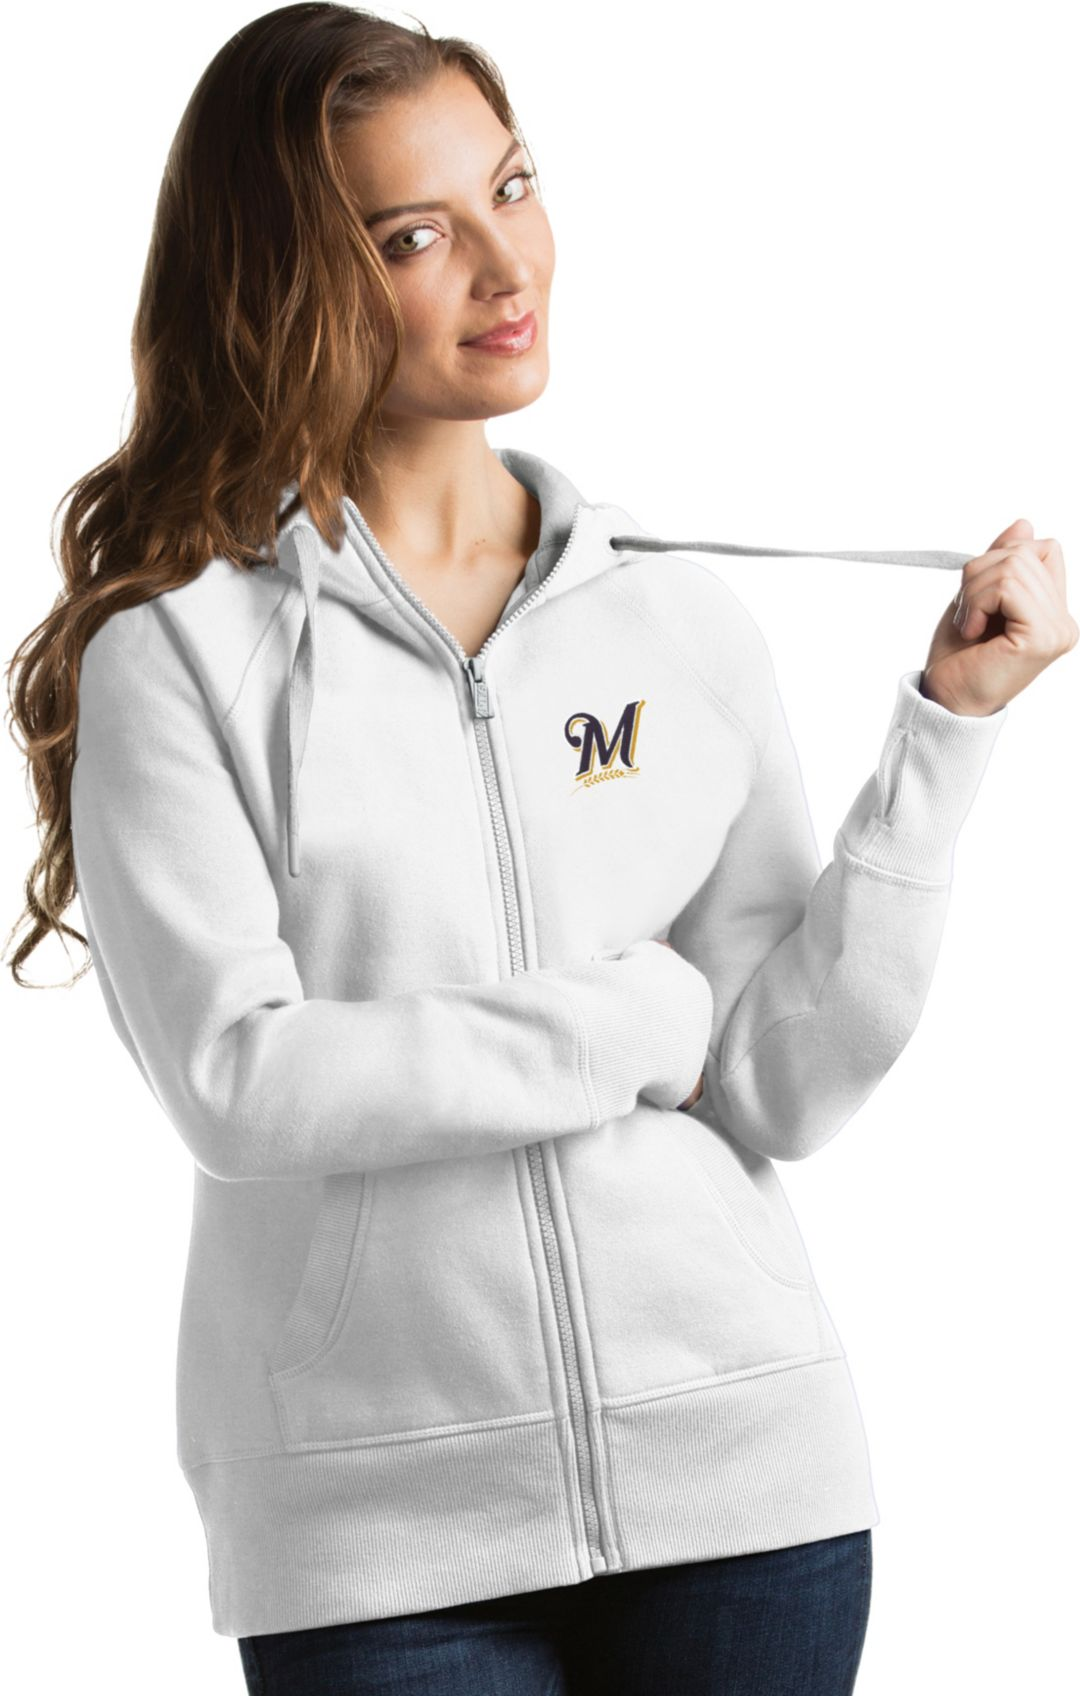 quality design 96c4a 9cdec Antigua Women's Milwaukee Brewers White Victory Full-Zip Hoodie